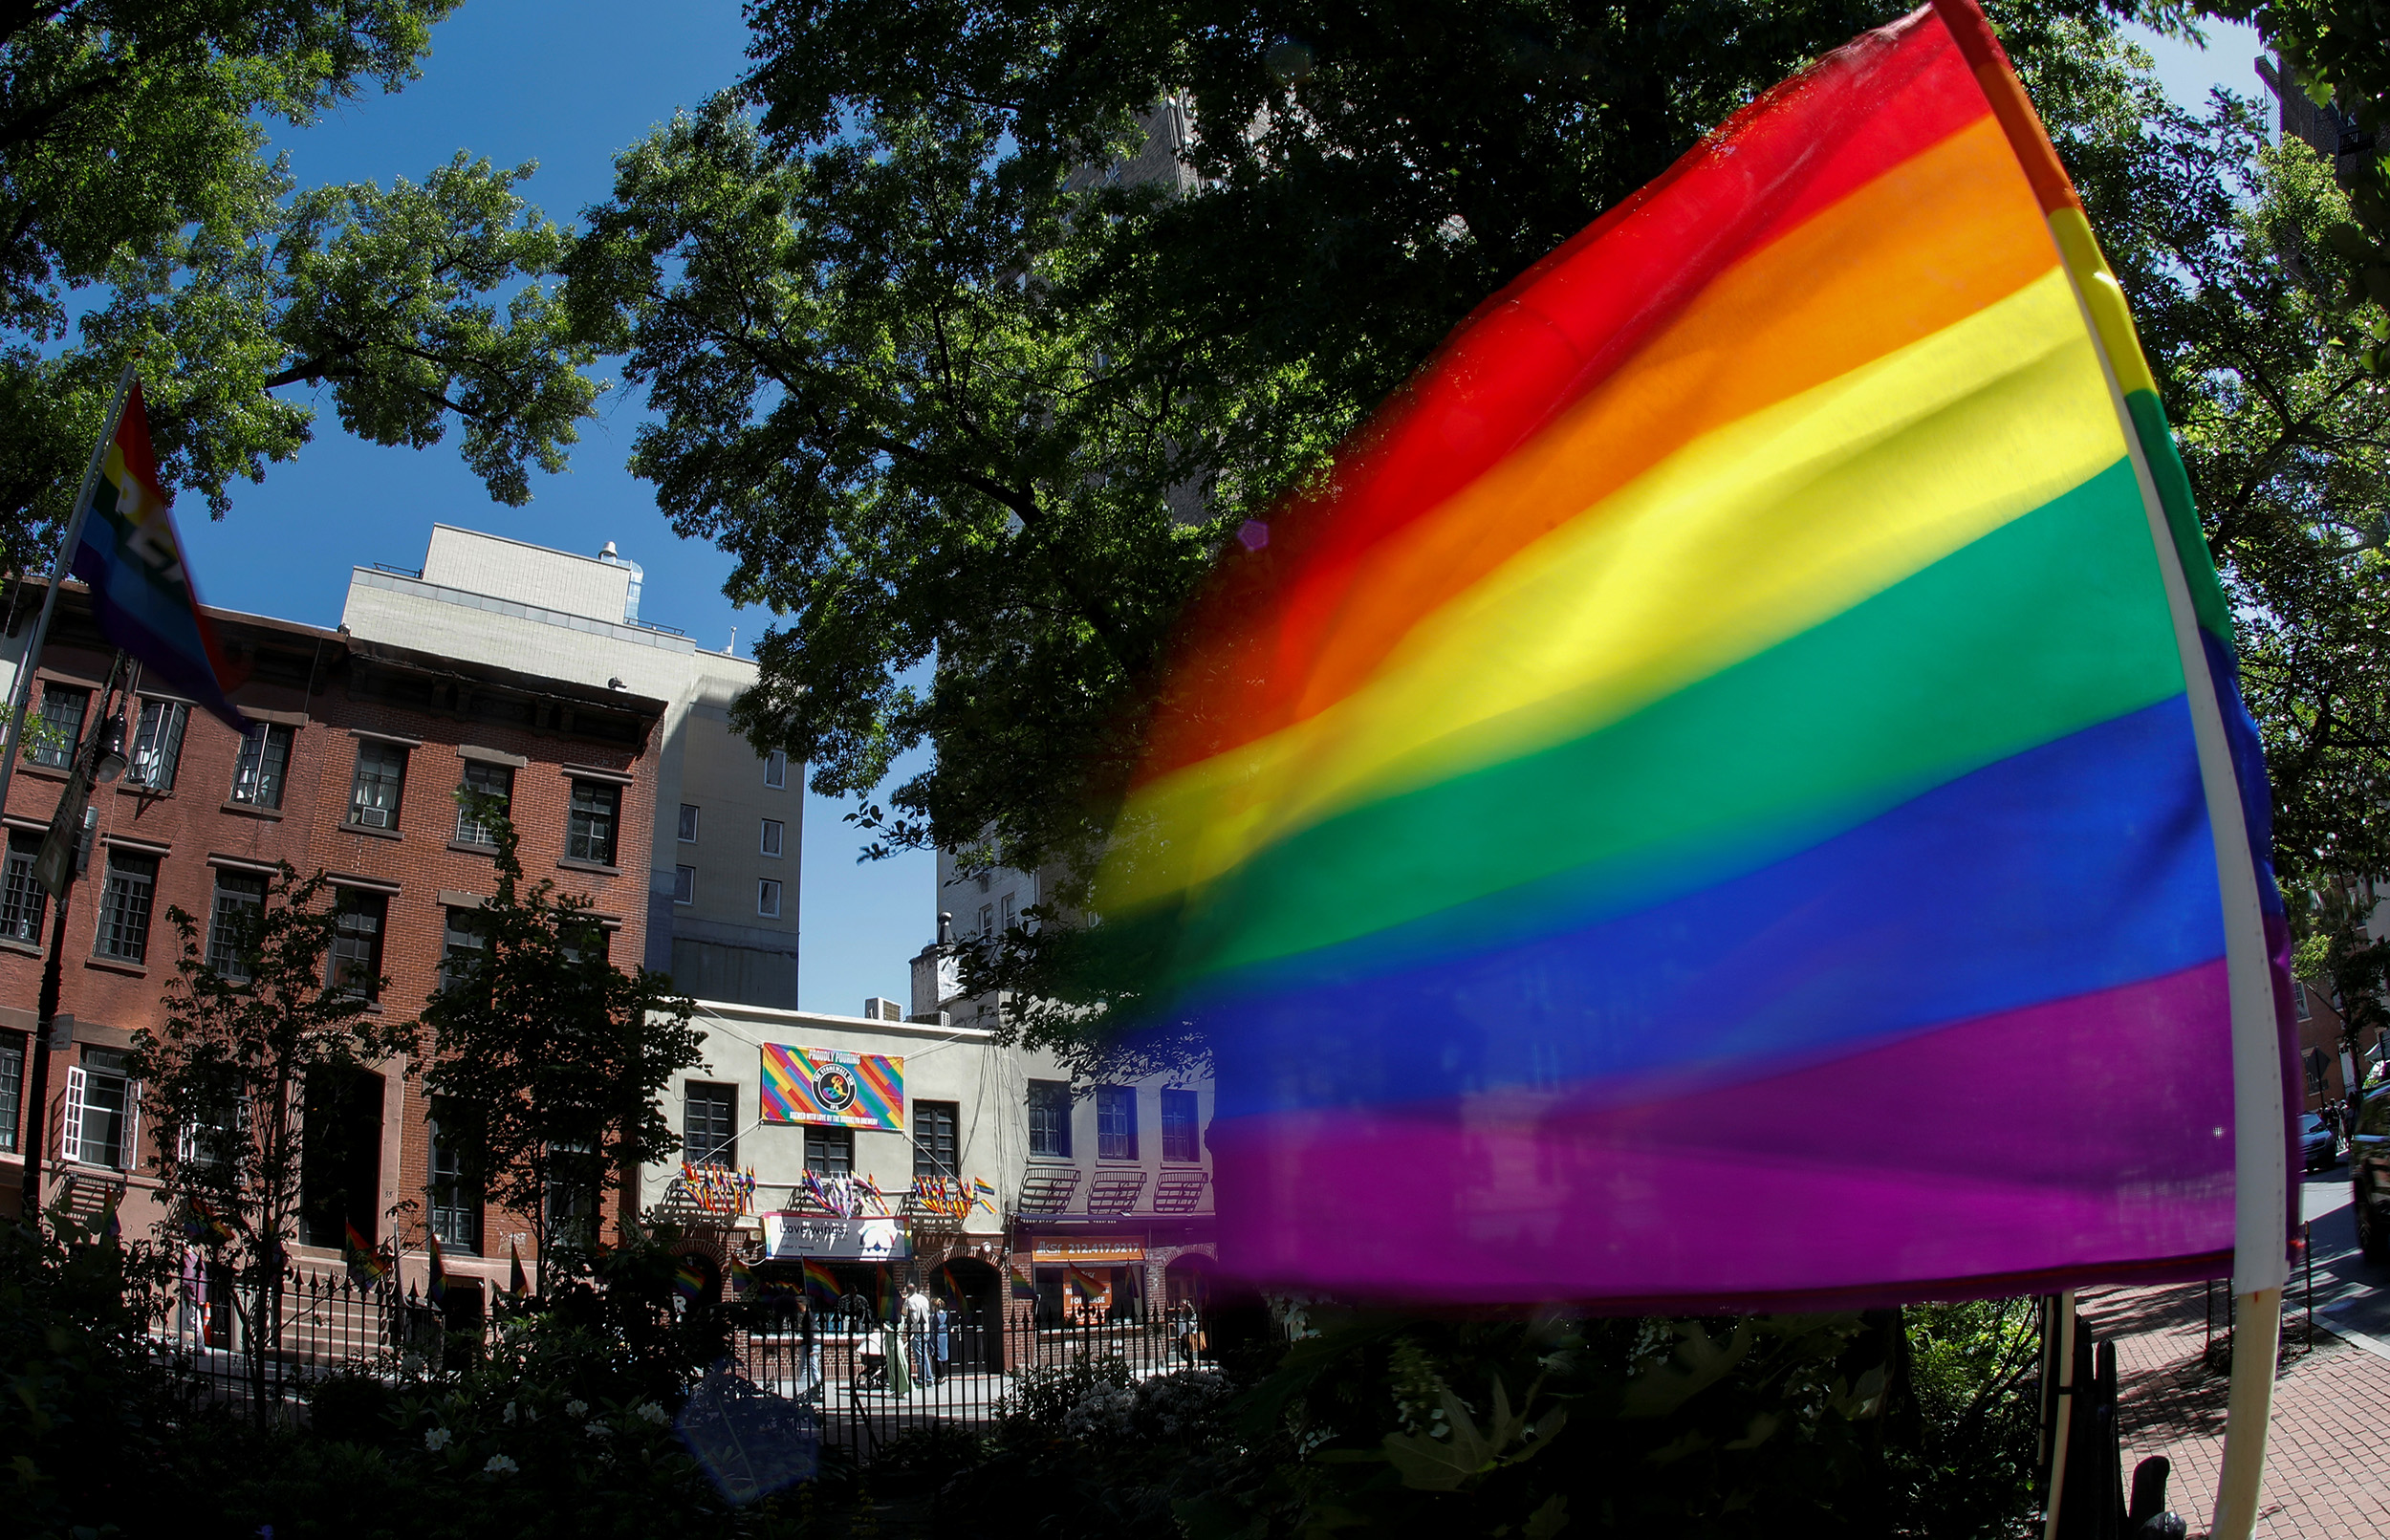 House of Representatives passes sweeping LGBTQ rights bill